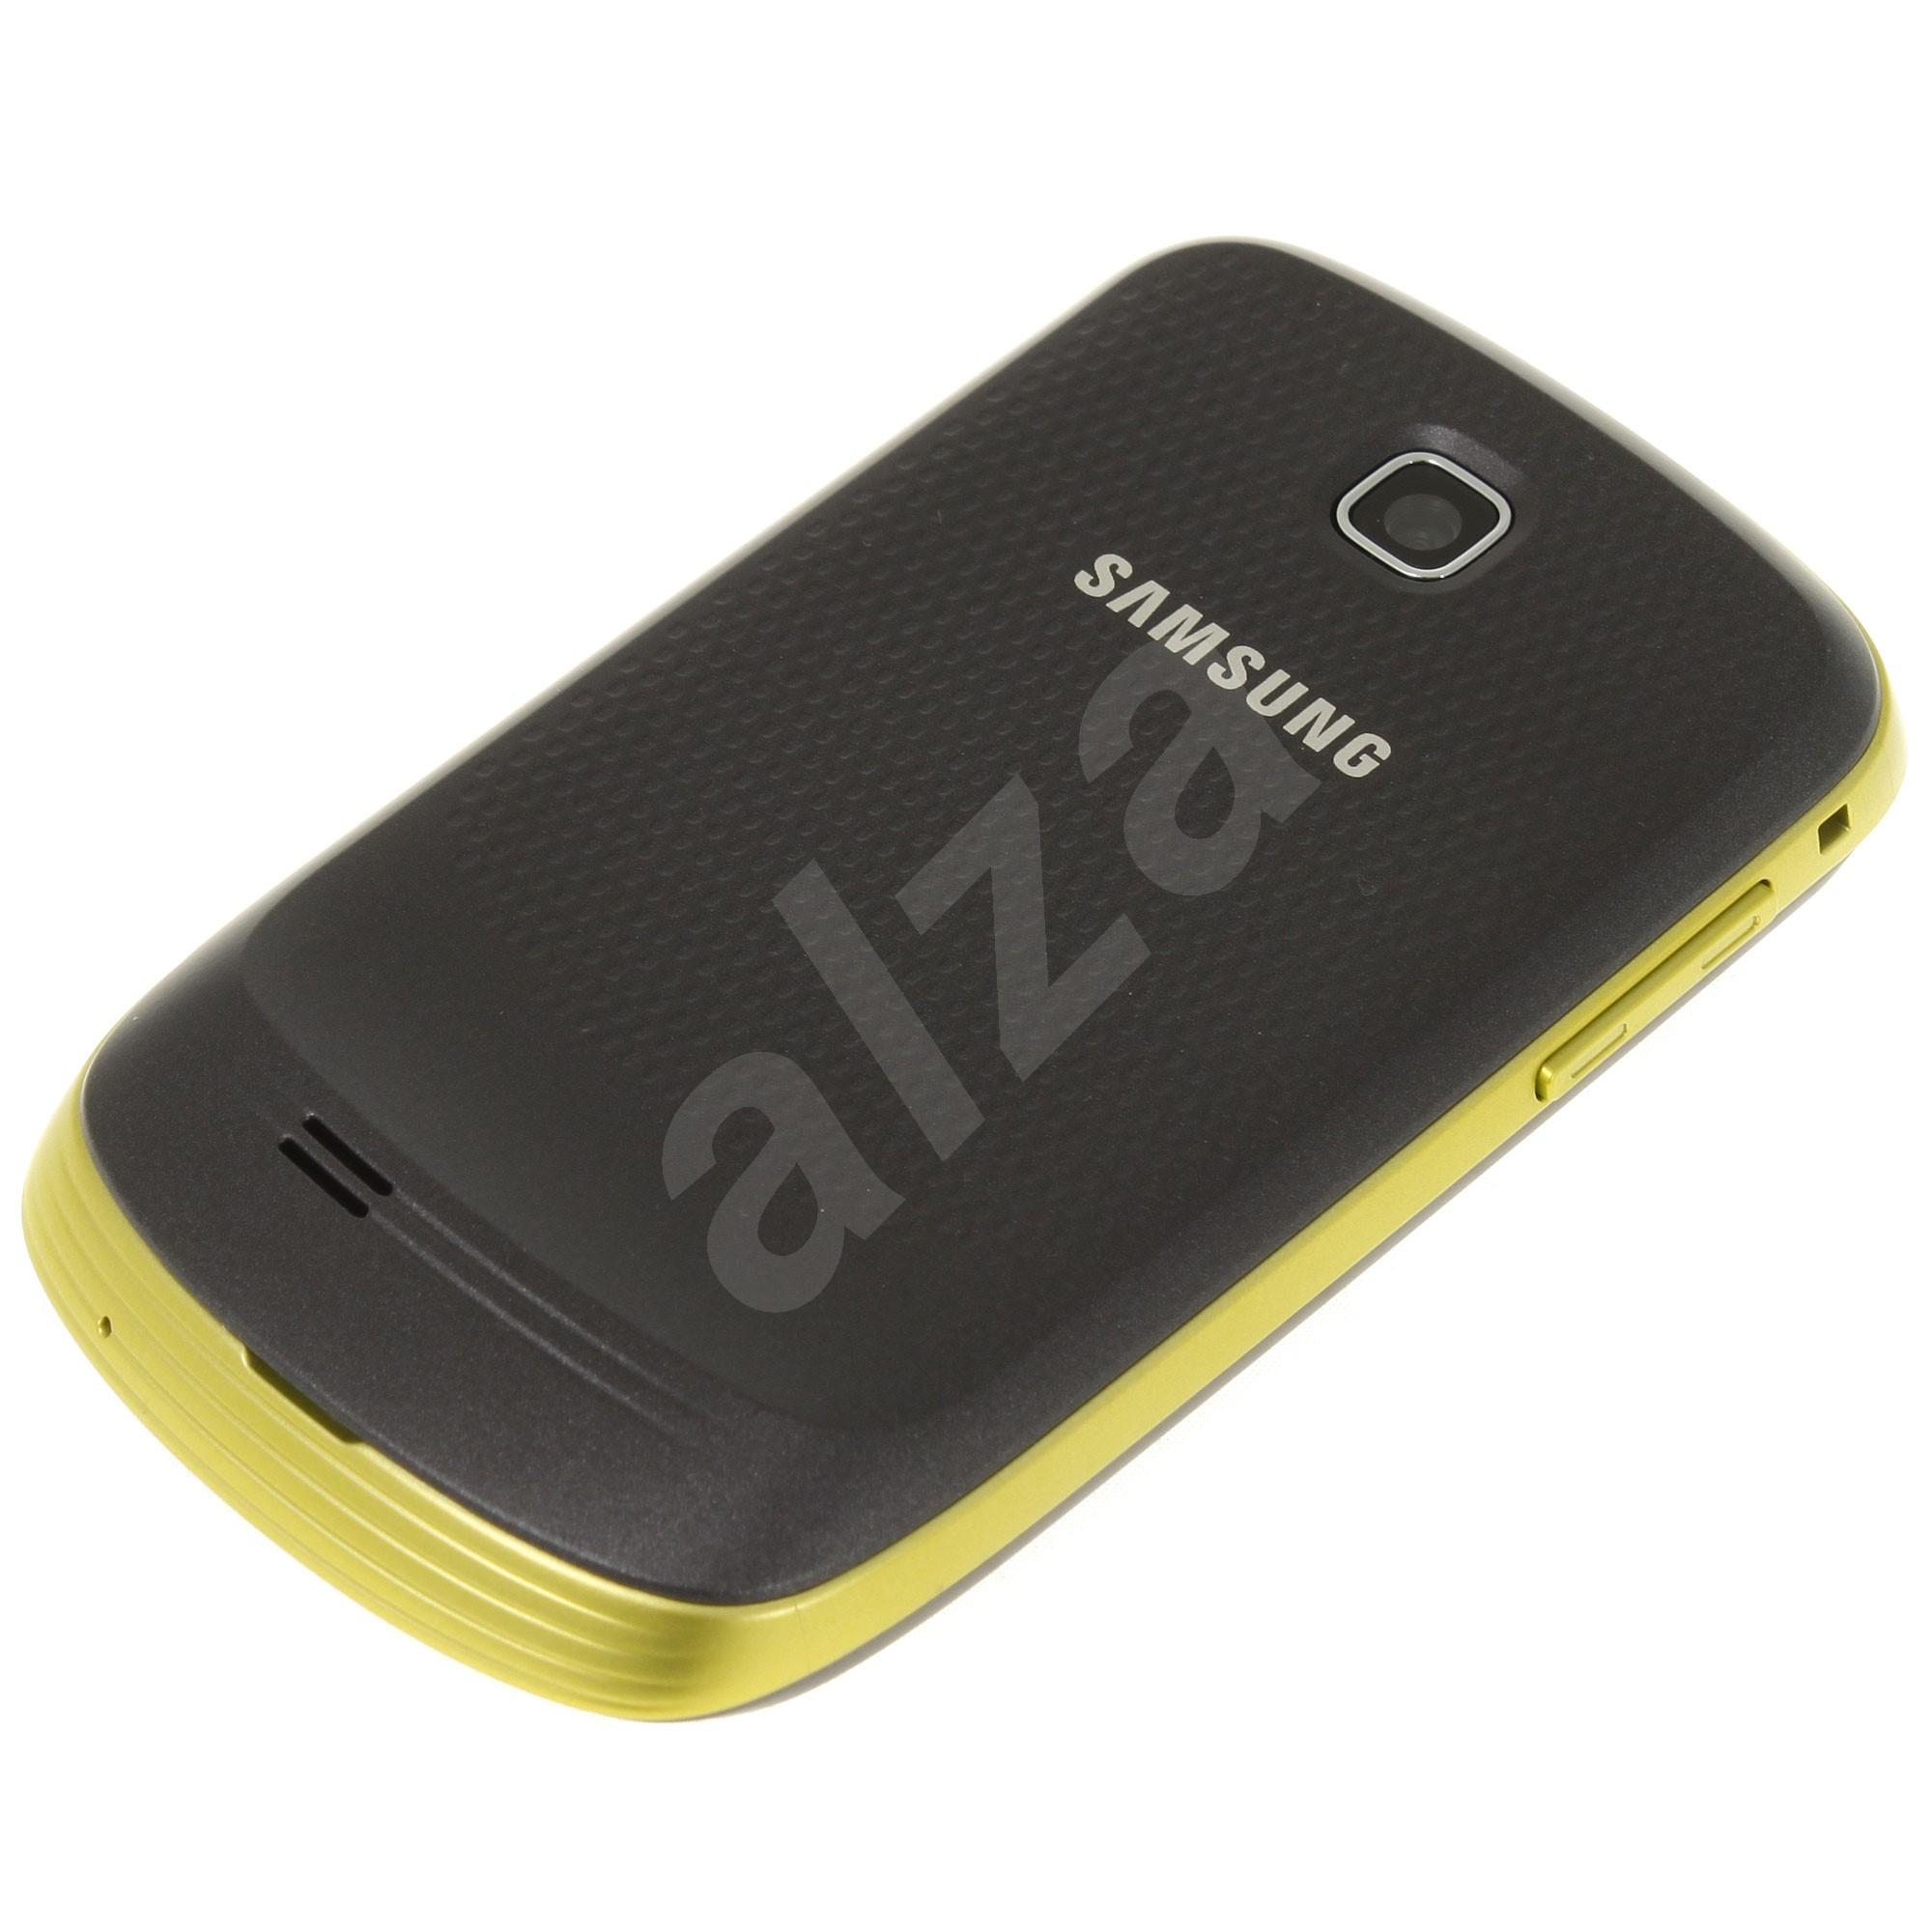 Samsung s5570 usb